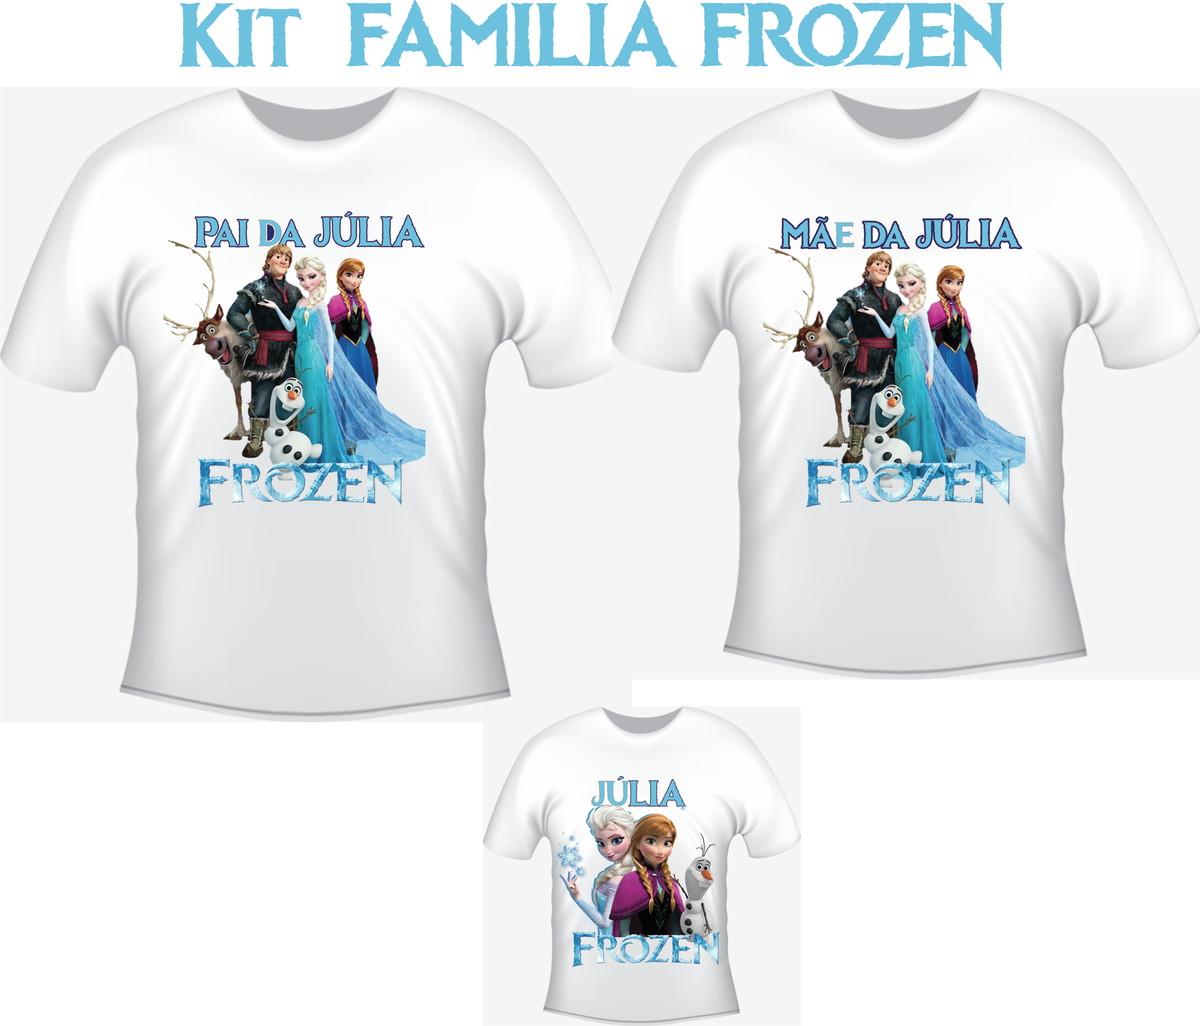 Camiseta Frozen Elsa Anna Kit  03 camisetas - Personalizada no Elo7 ... 9ae4ec8ab8484